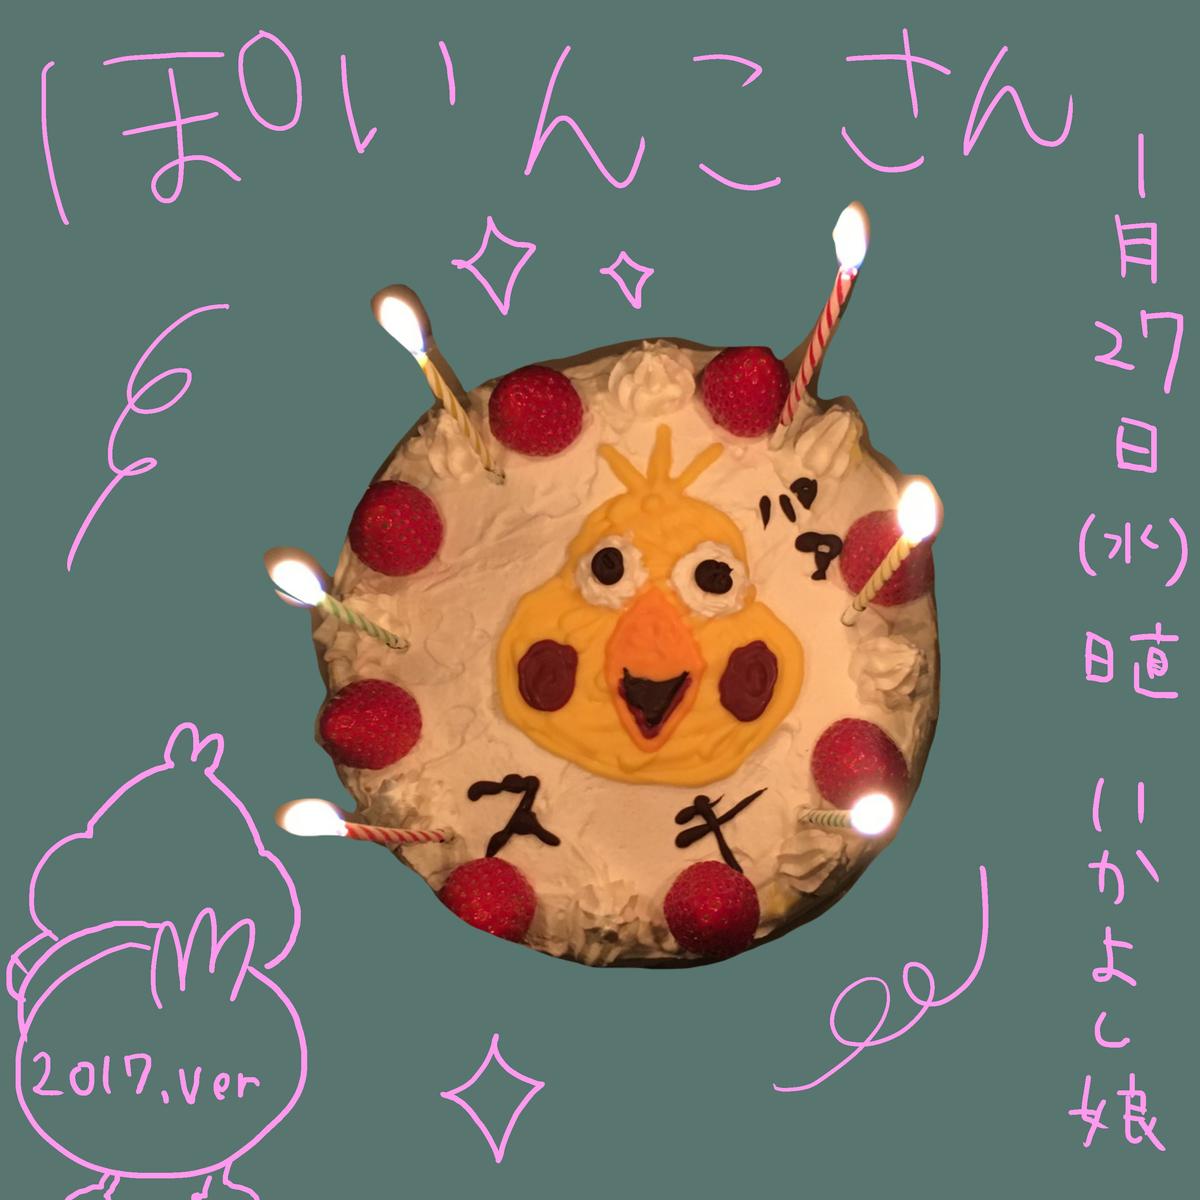 f:id:ika_yoshi:20210130062902j:plain